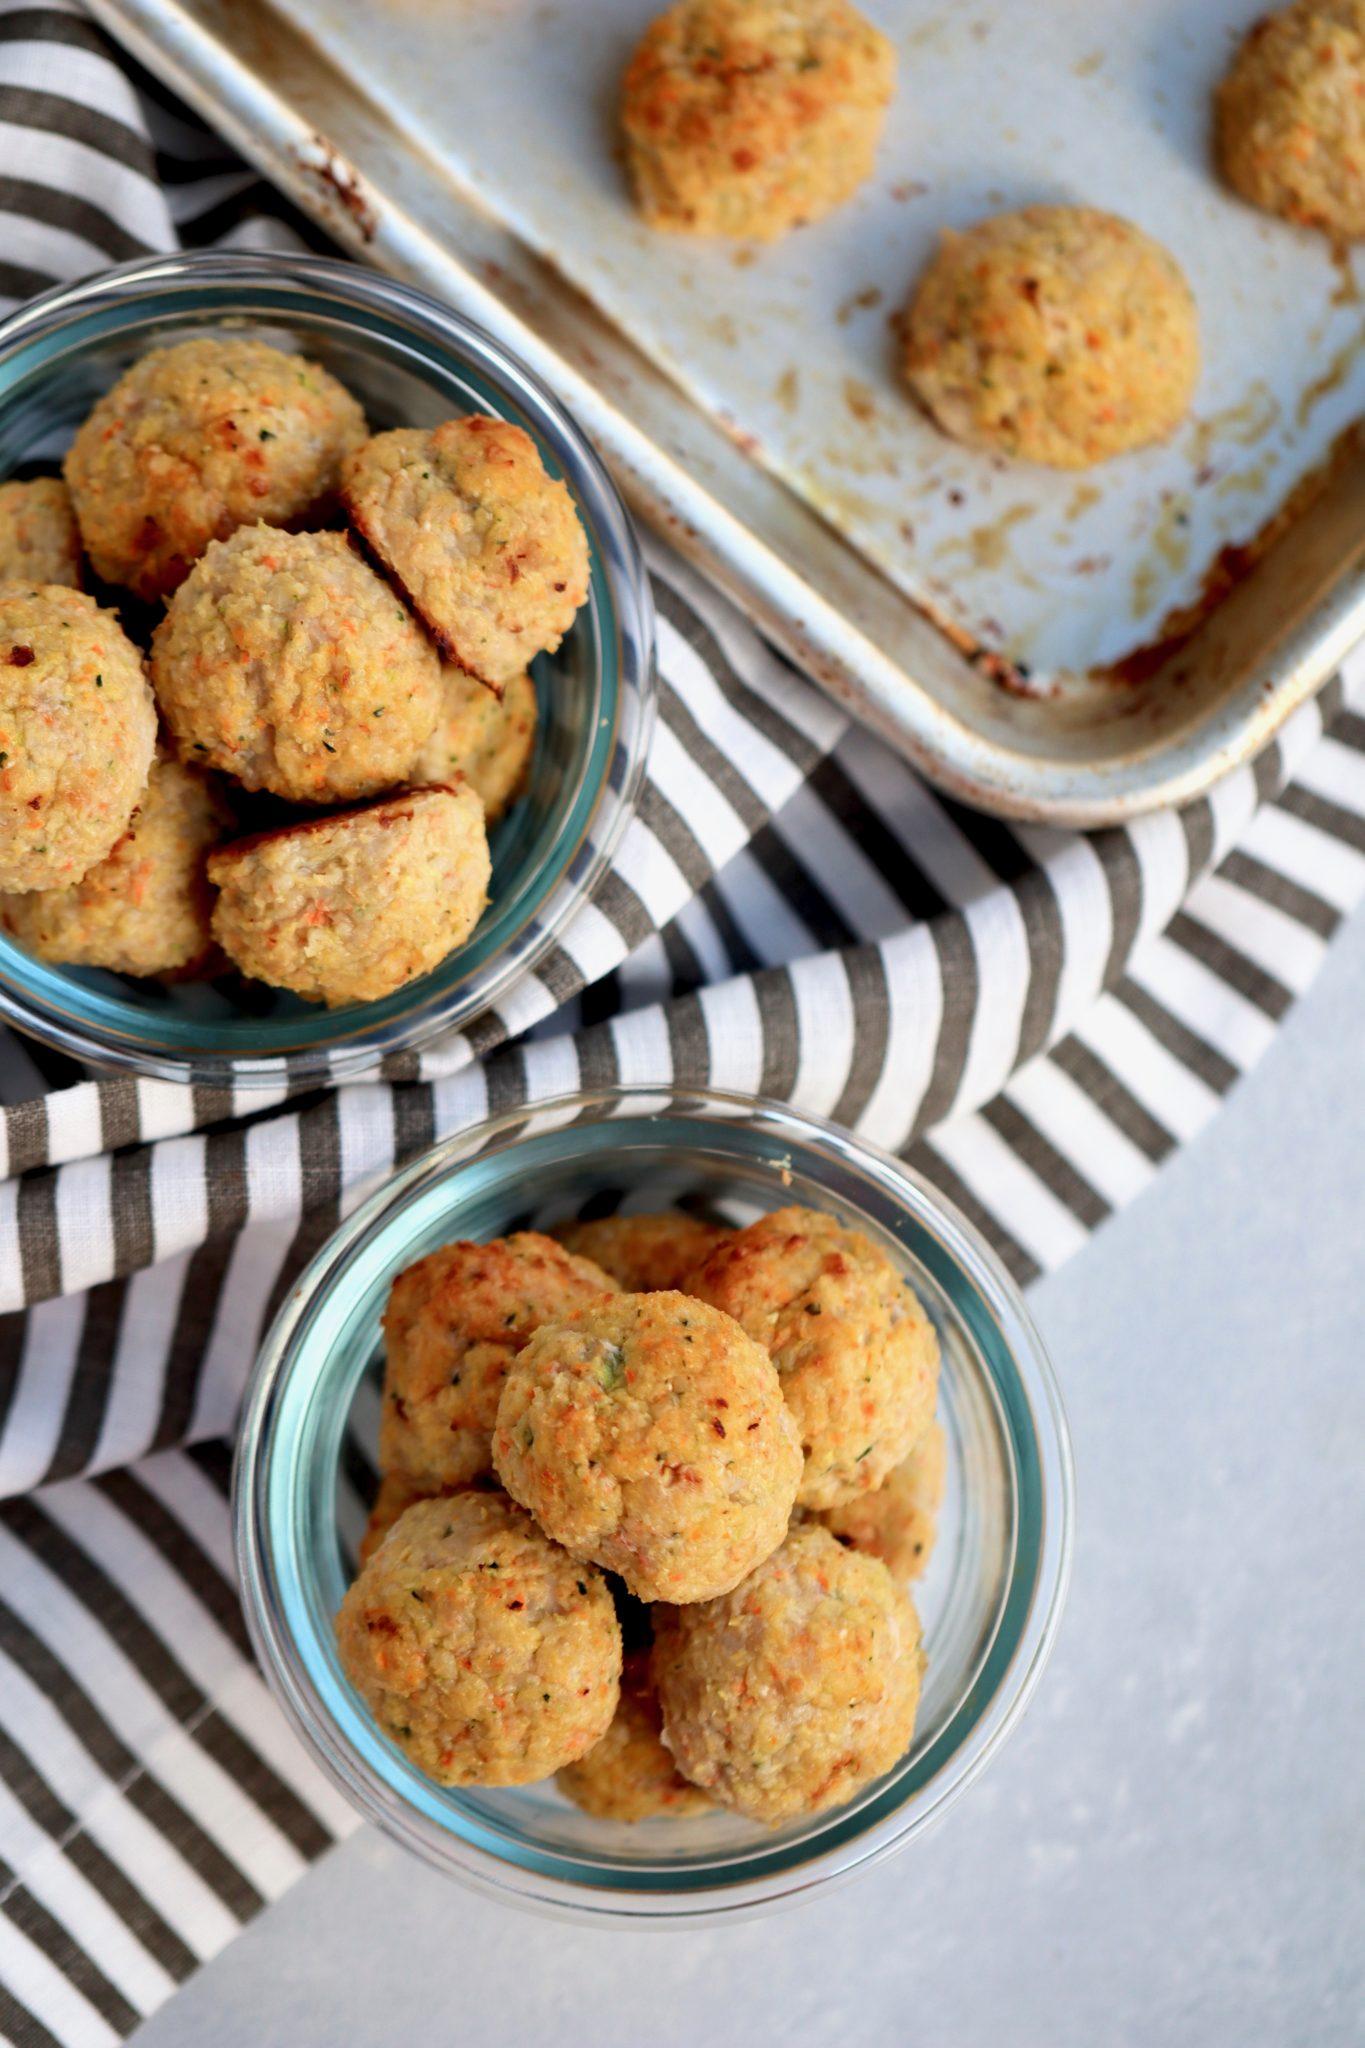 veggie-loaded baked chicken meatballs // cait's plate